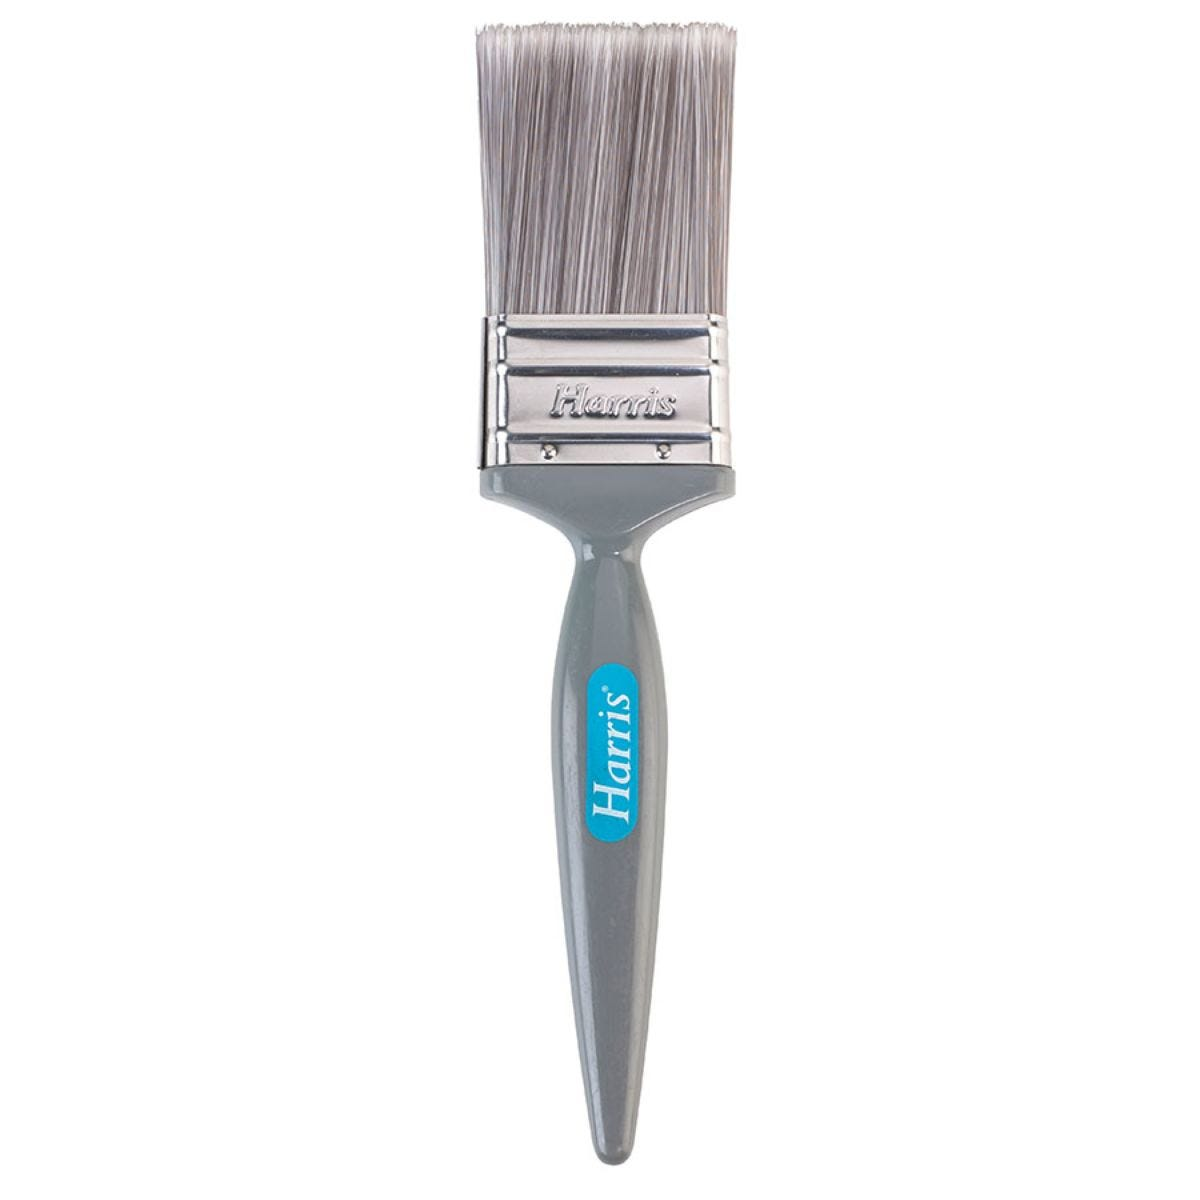 Harris 2-Inch Emulsion Brush